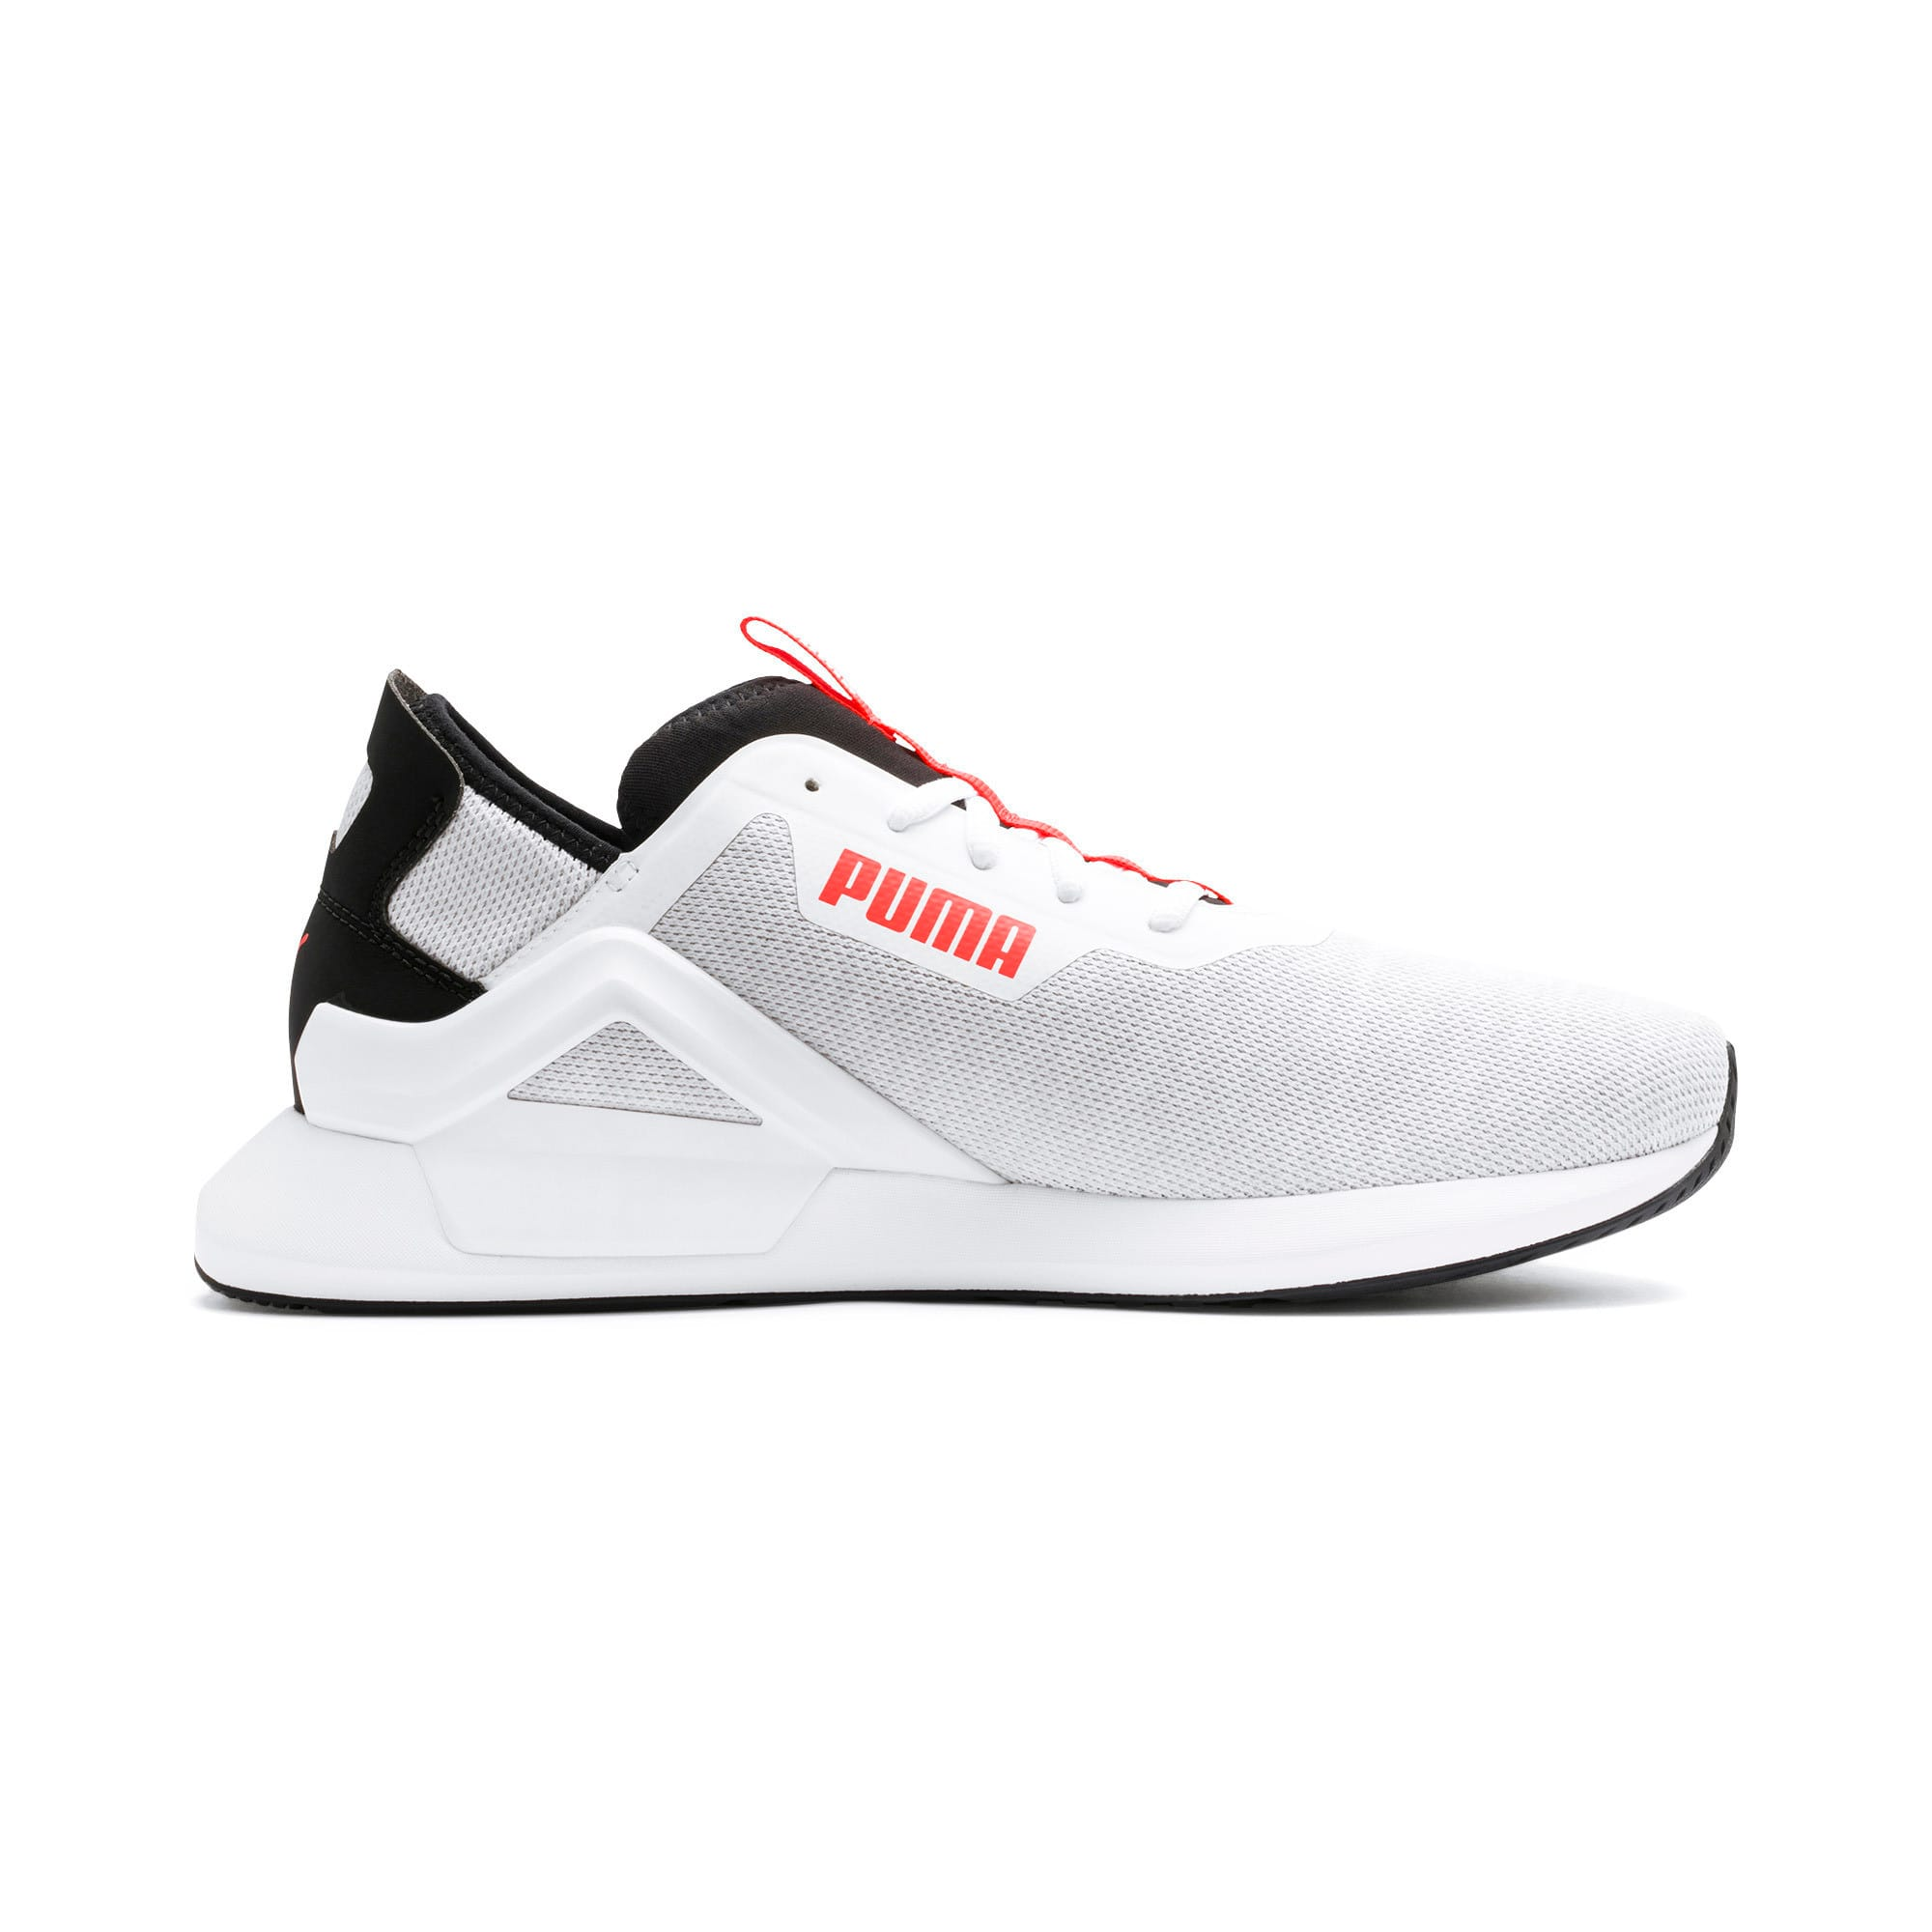 Thumbnail 6 of Rogue X Knit Herren Sneaker, White-Black-Nrgy Red, medium